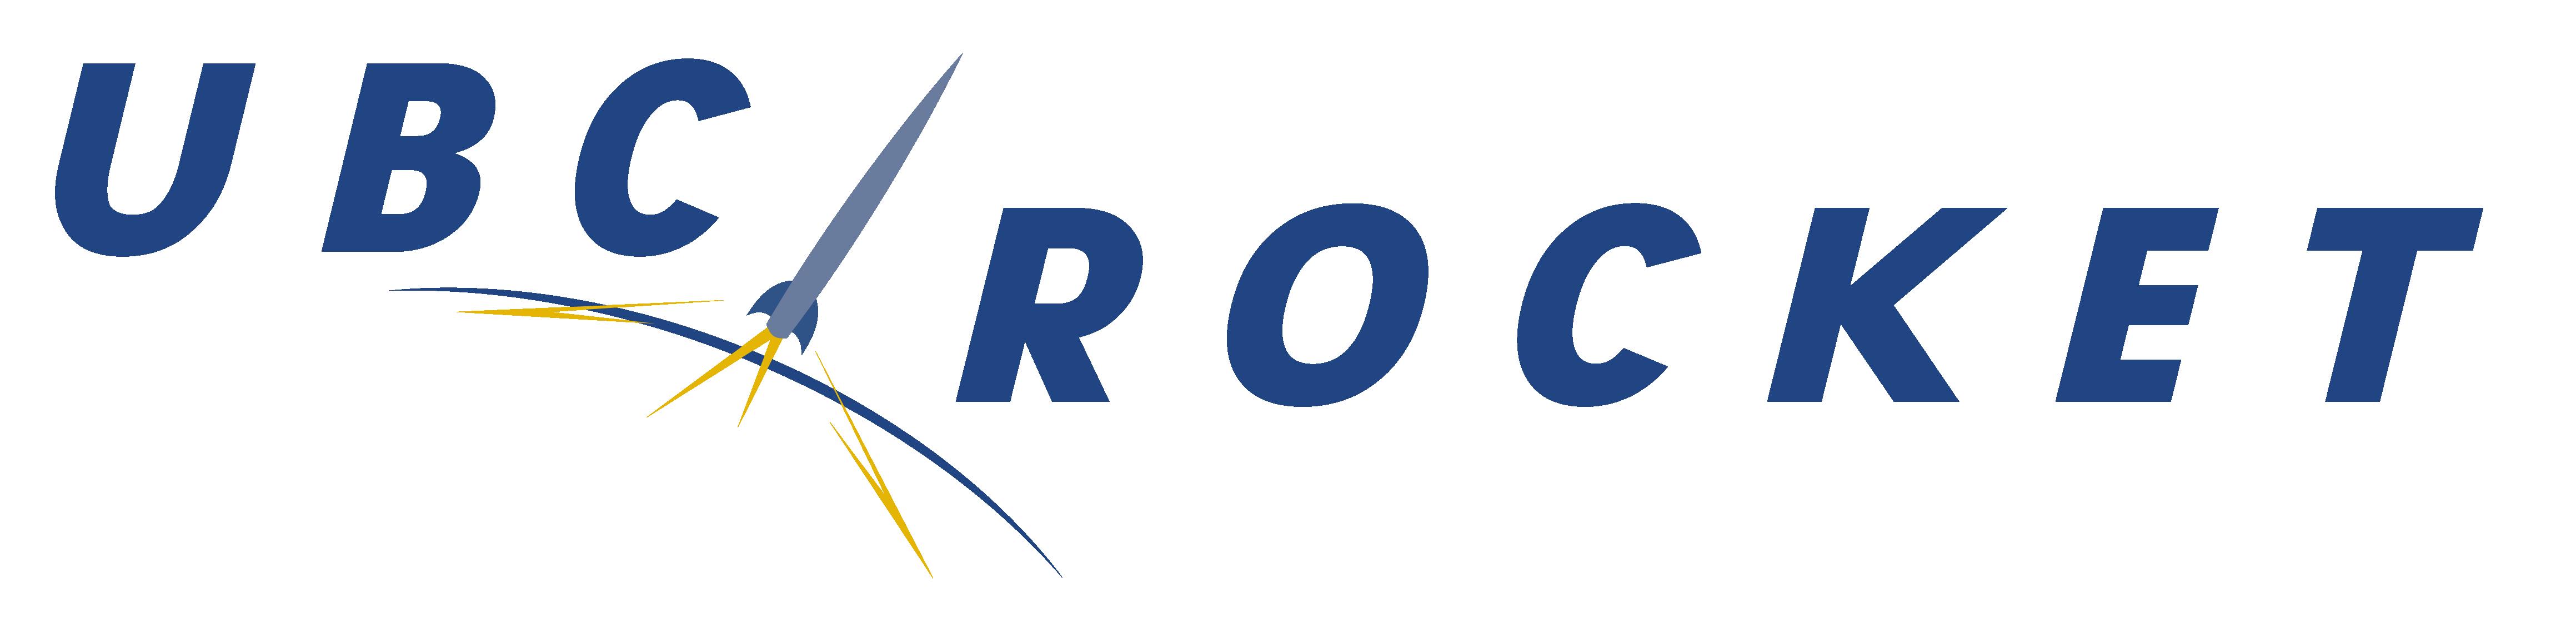 UBC Rocket